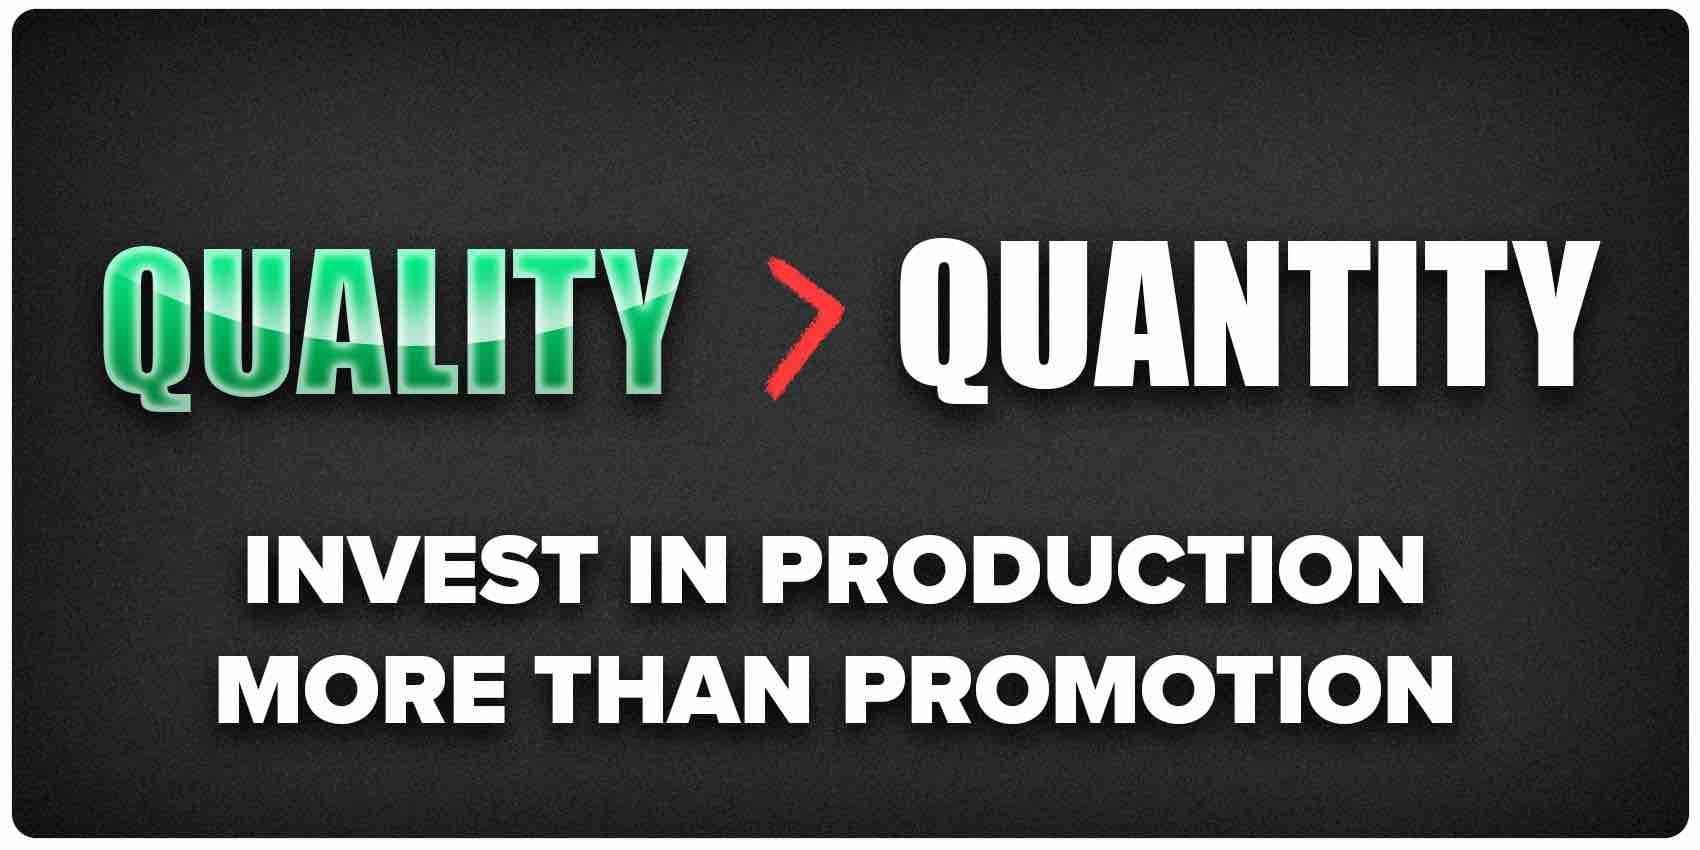 Quality over quantity to get on Release Radar